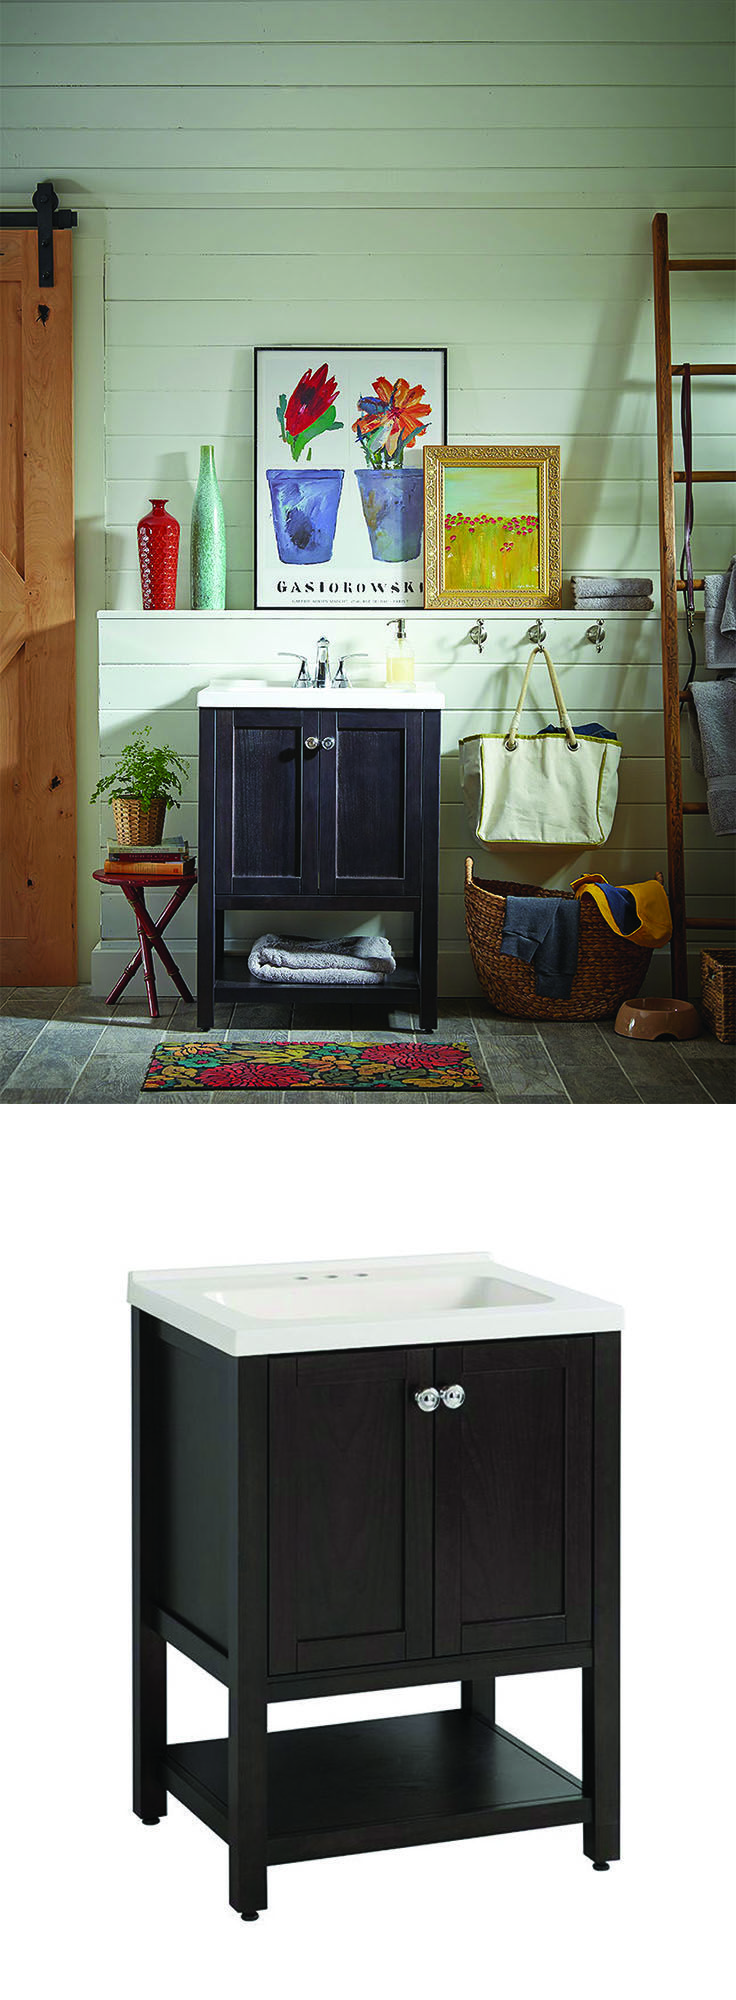 Bathroom Vanities in 3 Unexpected Places. 382 best Bathroom Design Ideas images on Pinterest